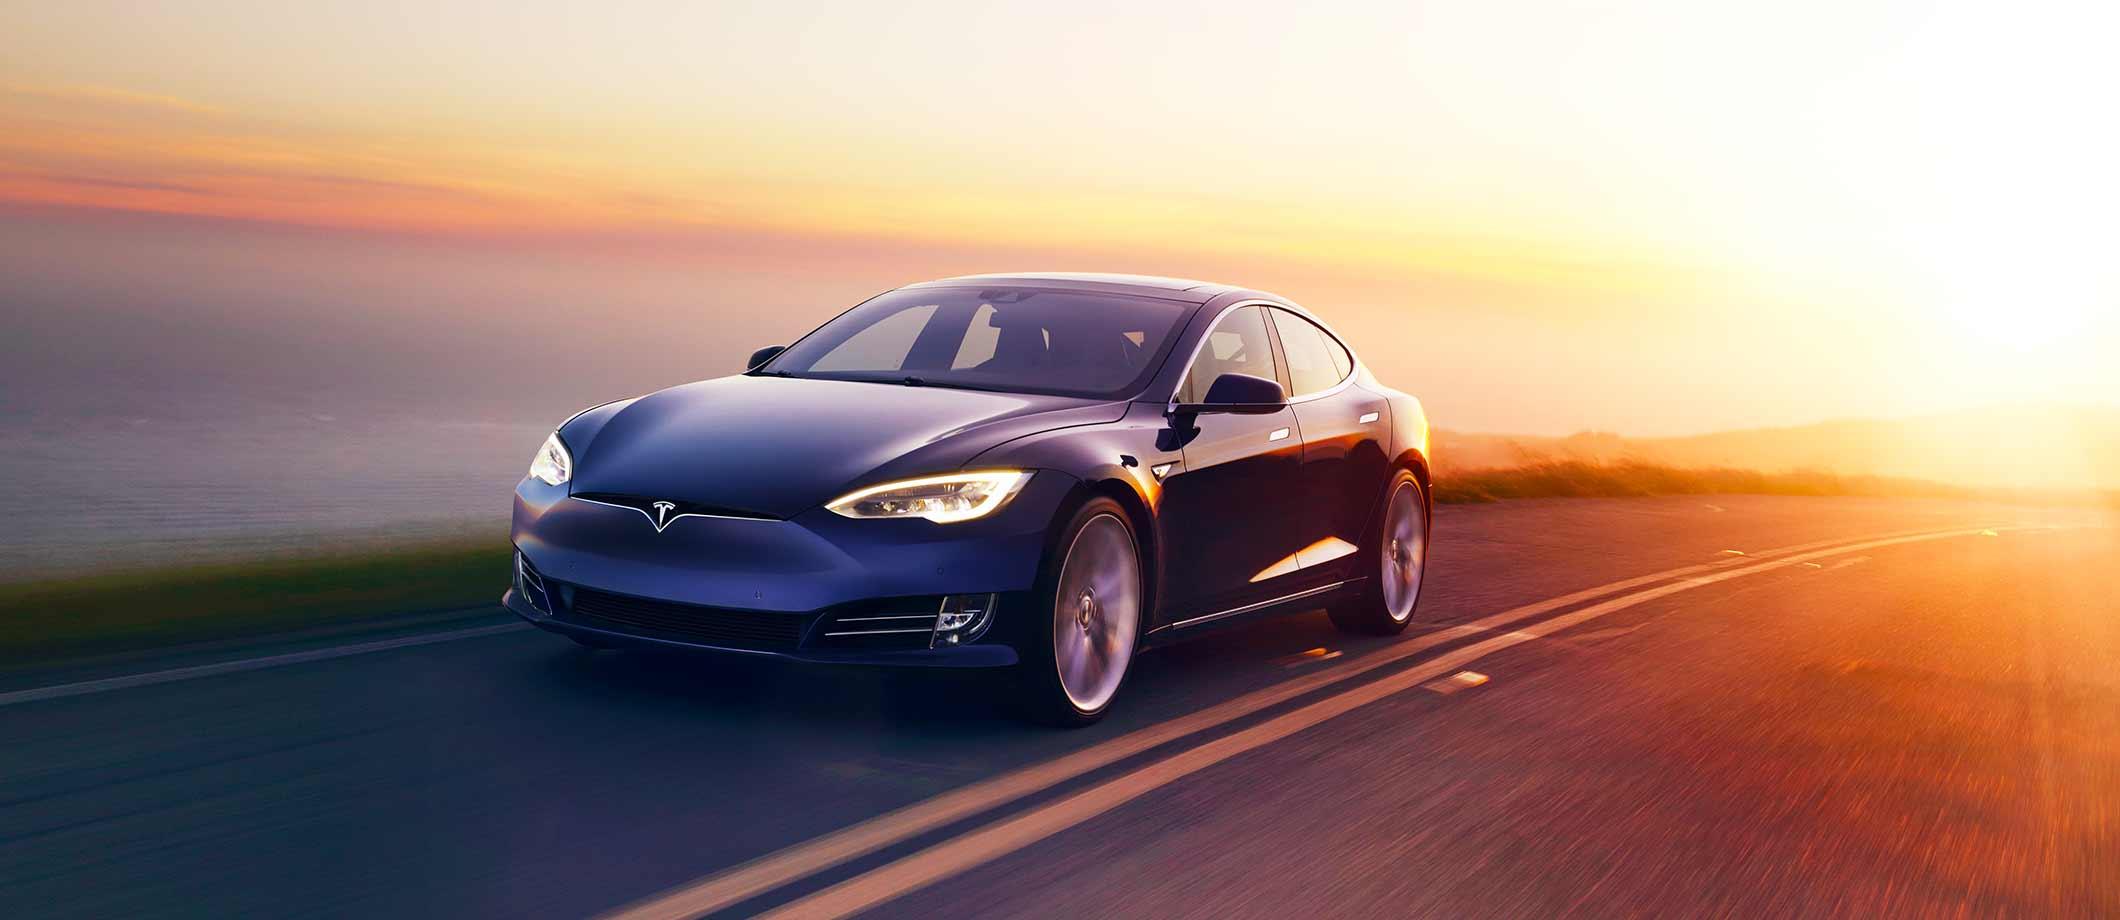 Tesla S fährt auf Straße